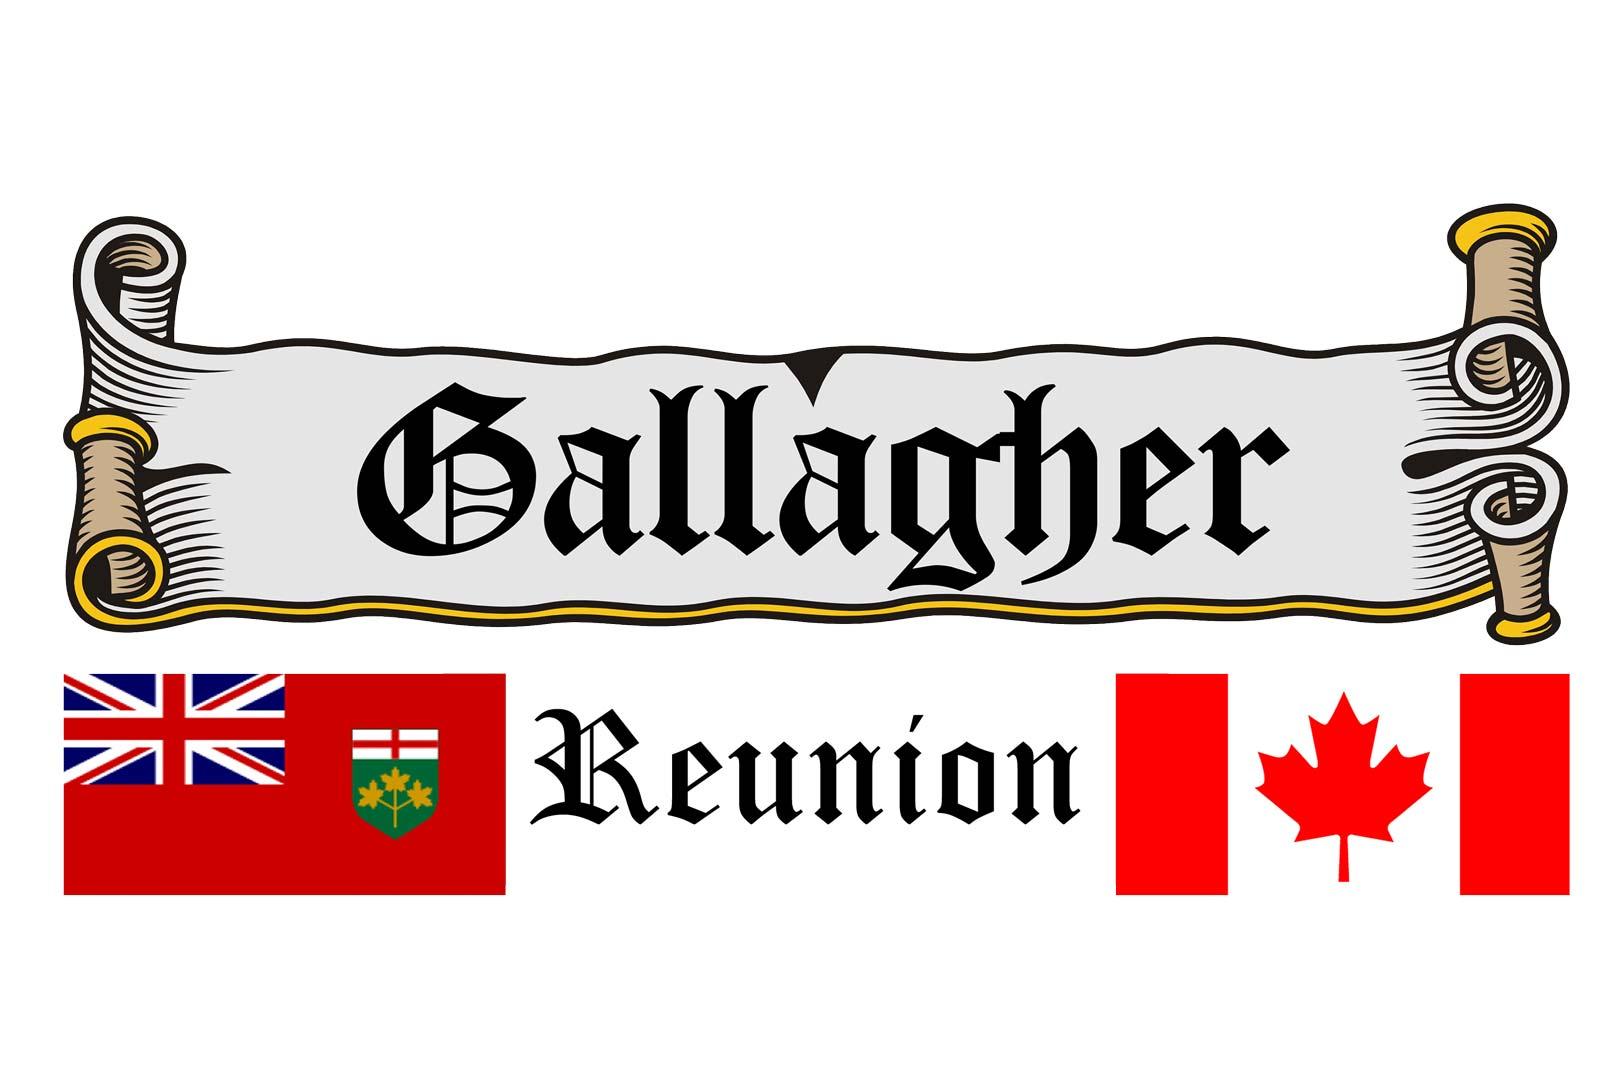 Gallagher Reunion